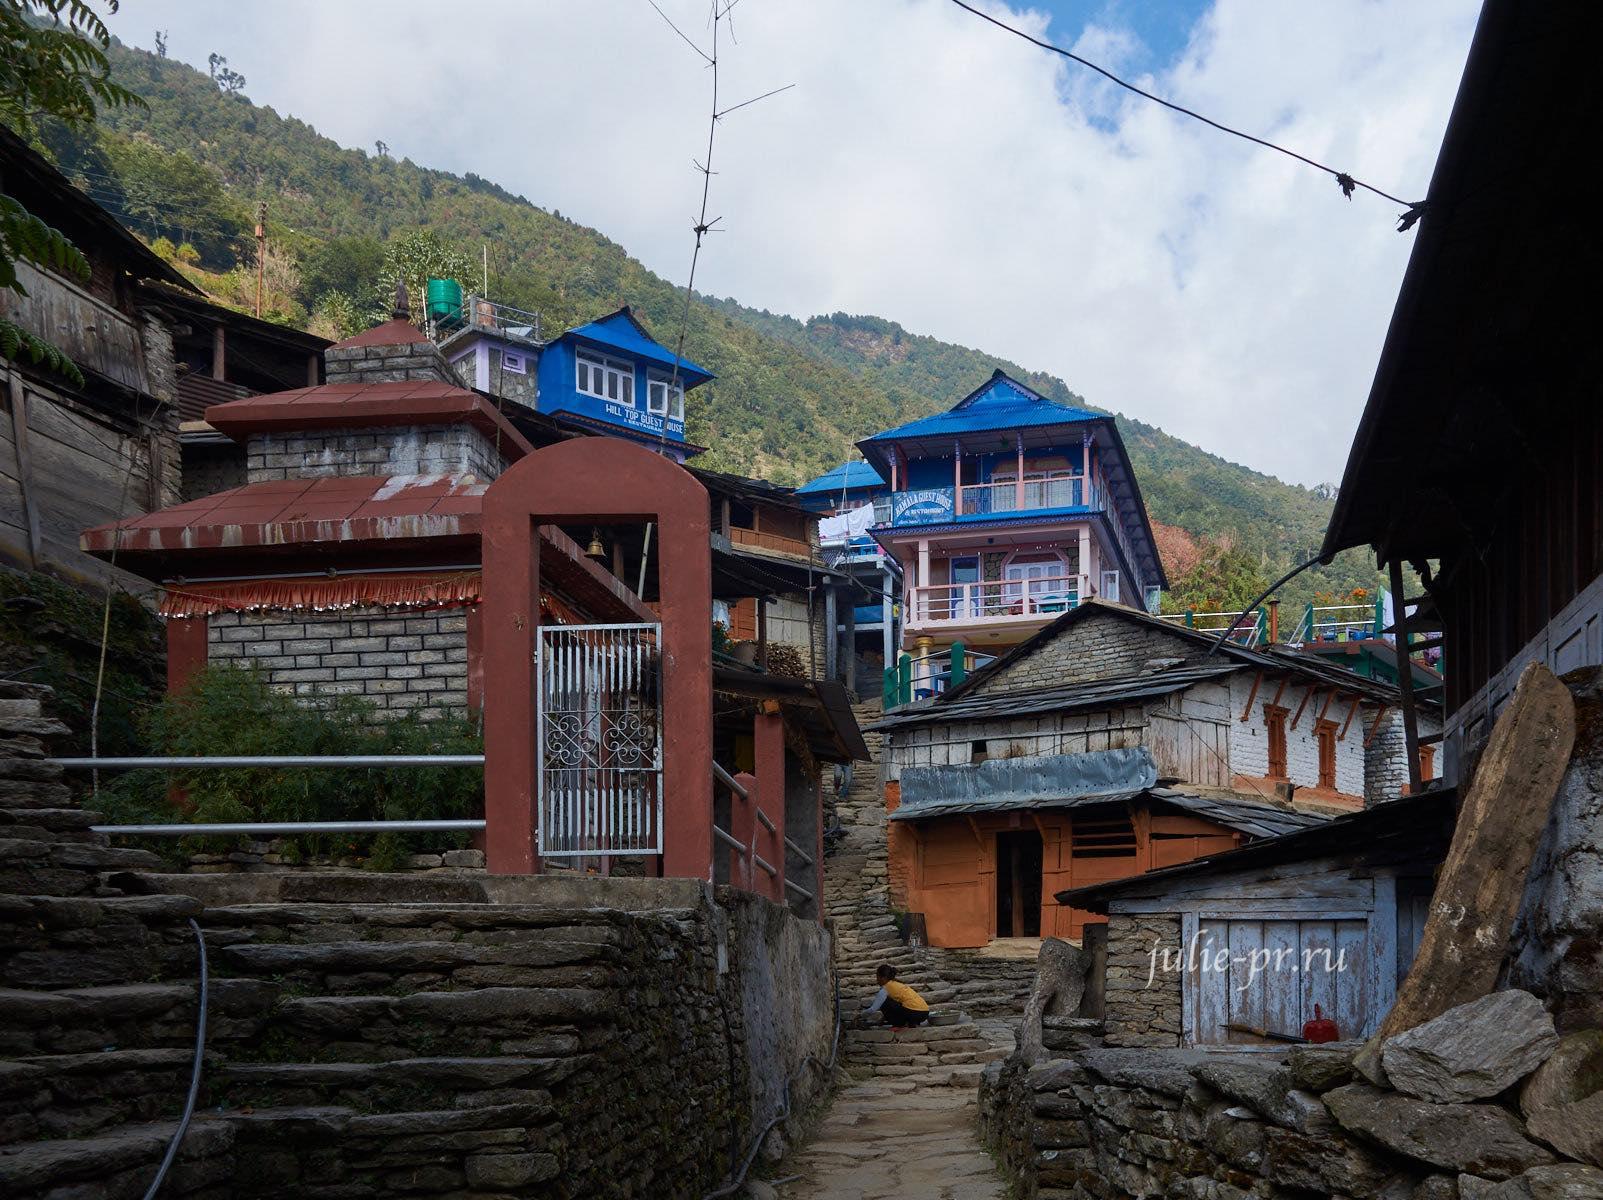 Непал, Пун-Хилл трек, Деревня Уллери